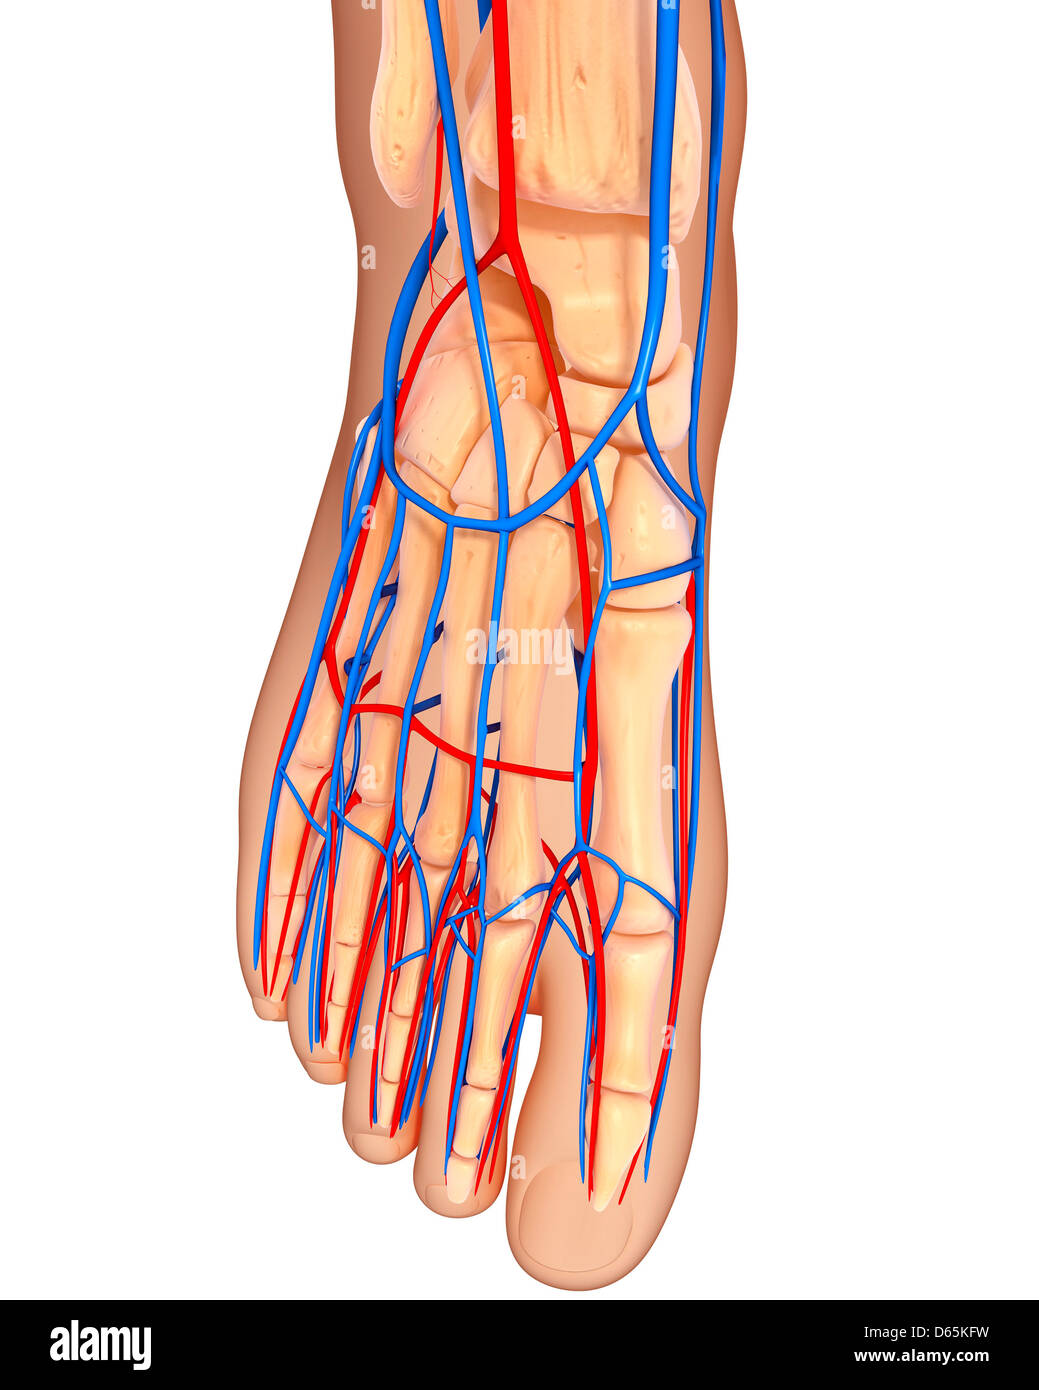 Foot anatomy, artwork - Stock Image